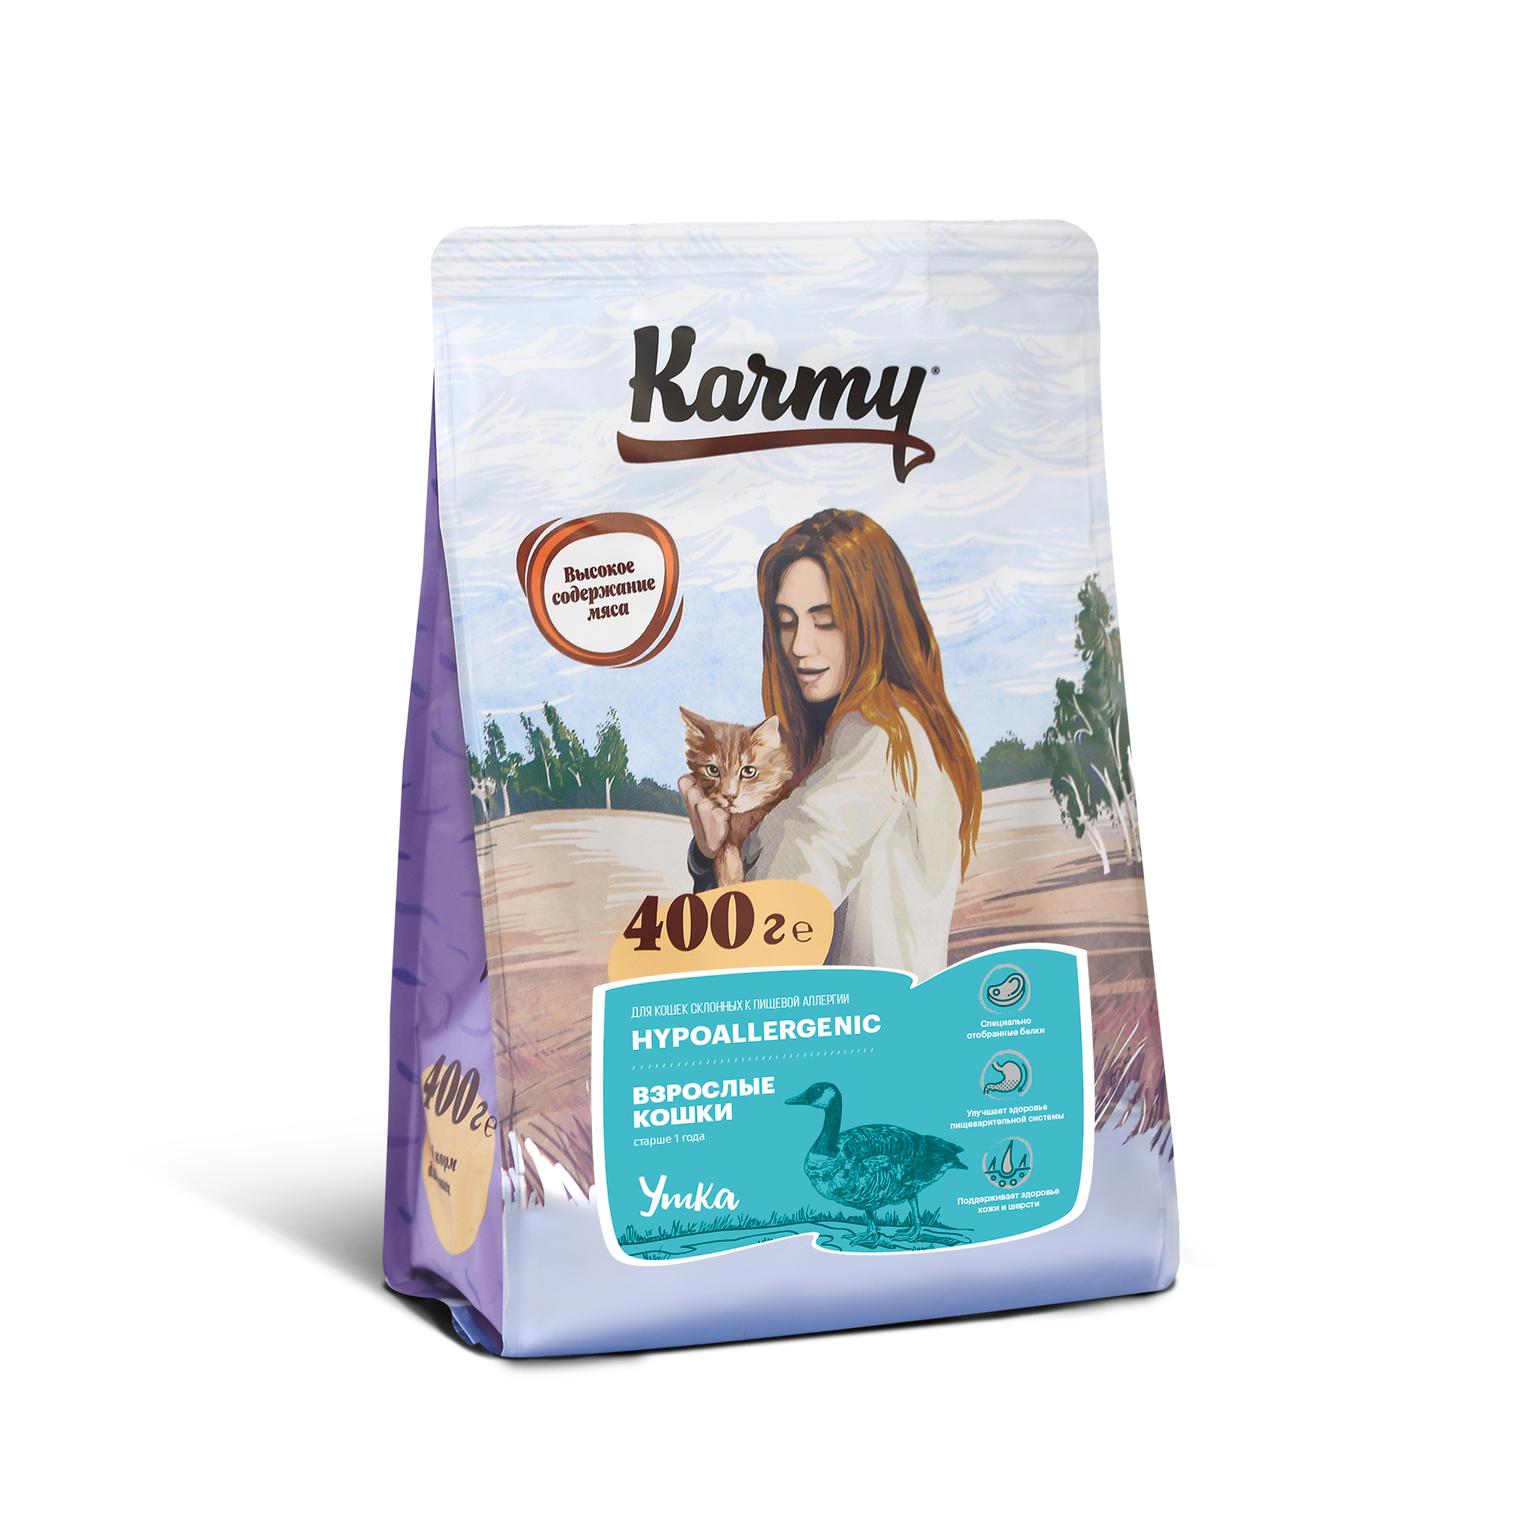 Сухой корм для кошек Karmy Hypoallergenic, гипоаллергенный,